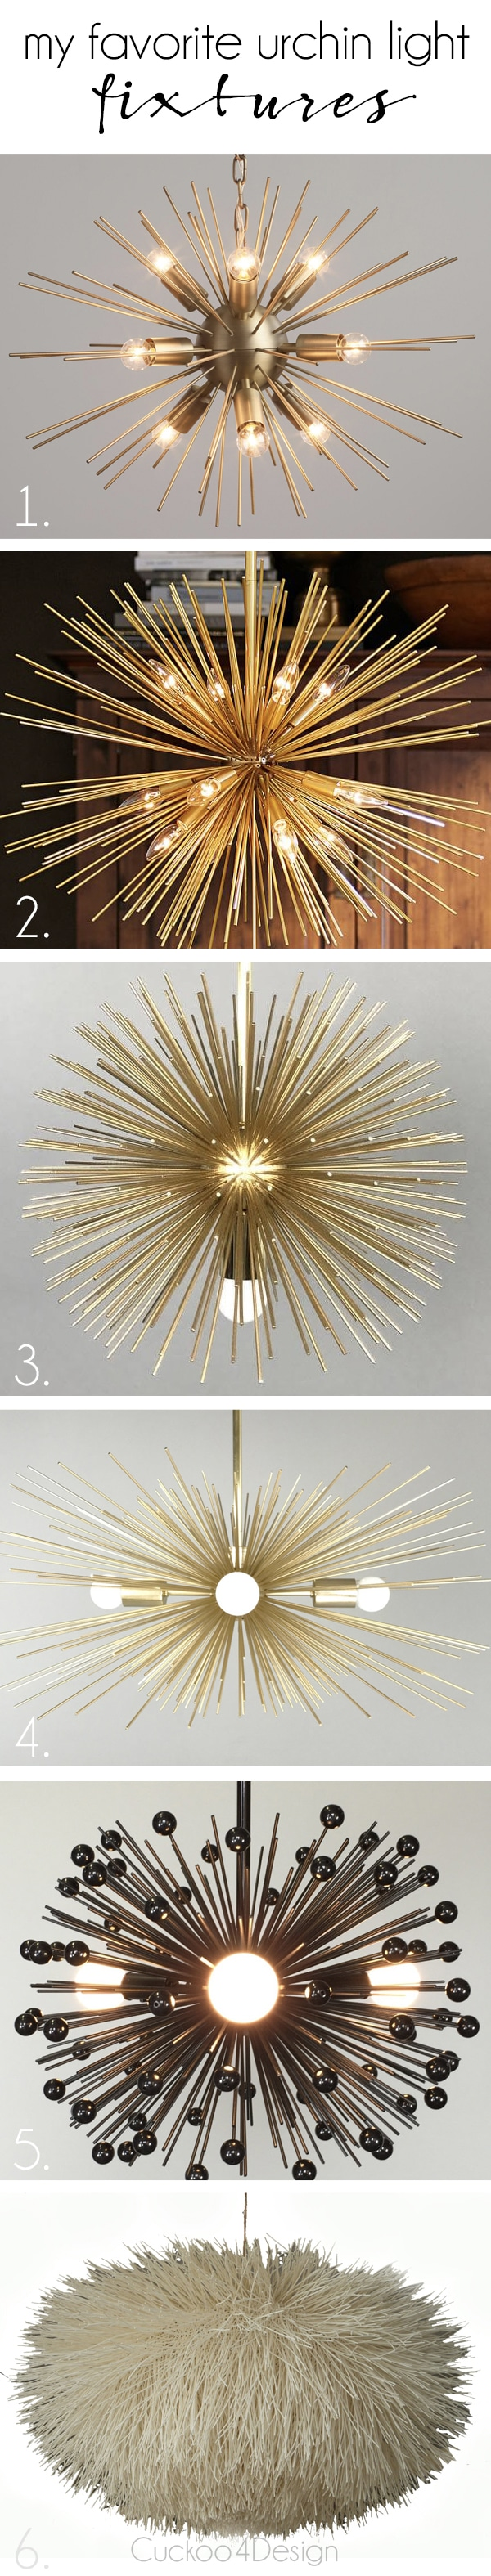 my favorite urchin light fixtures